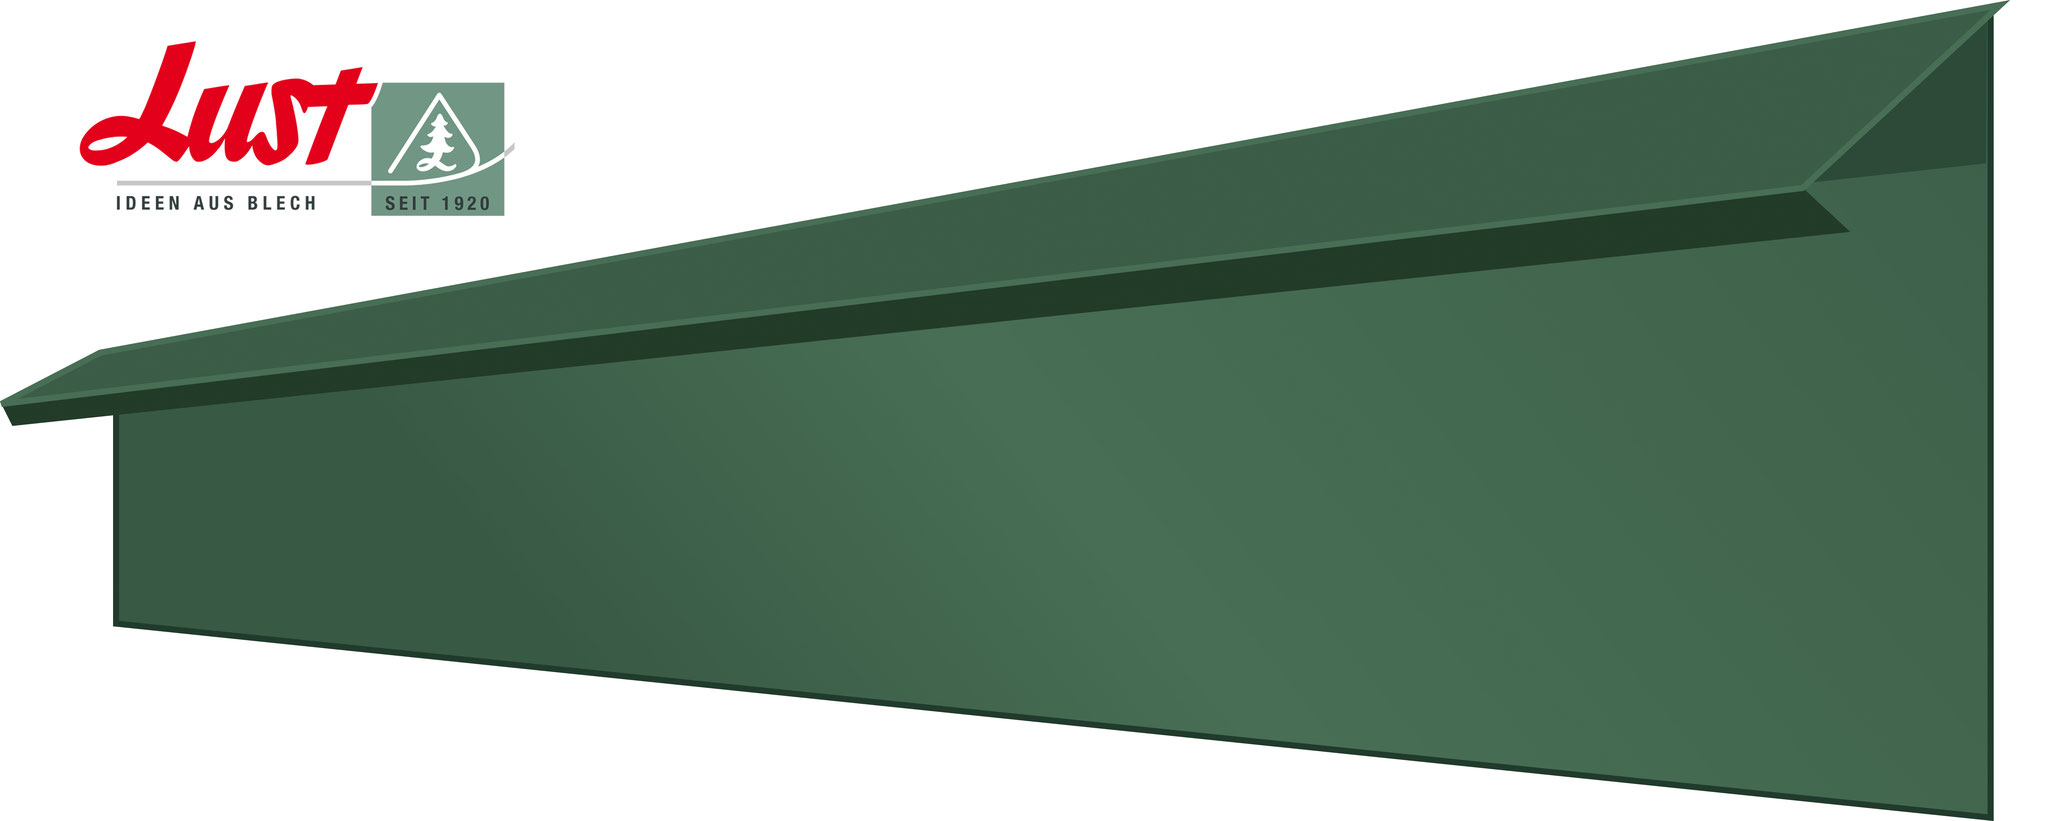 Schneckenblech grün pulverbeschichtet